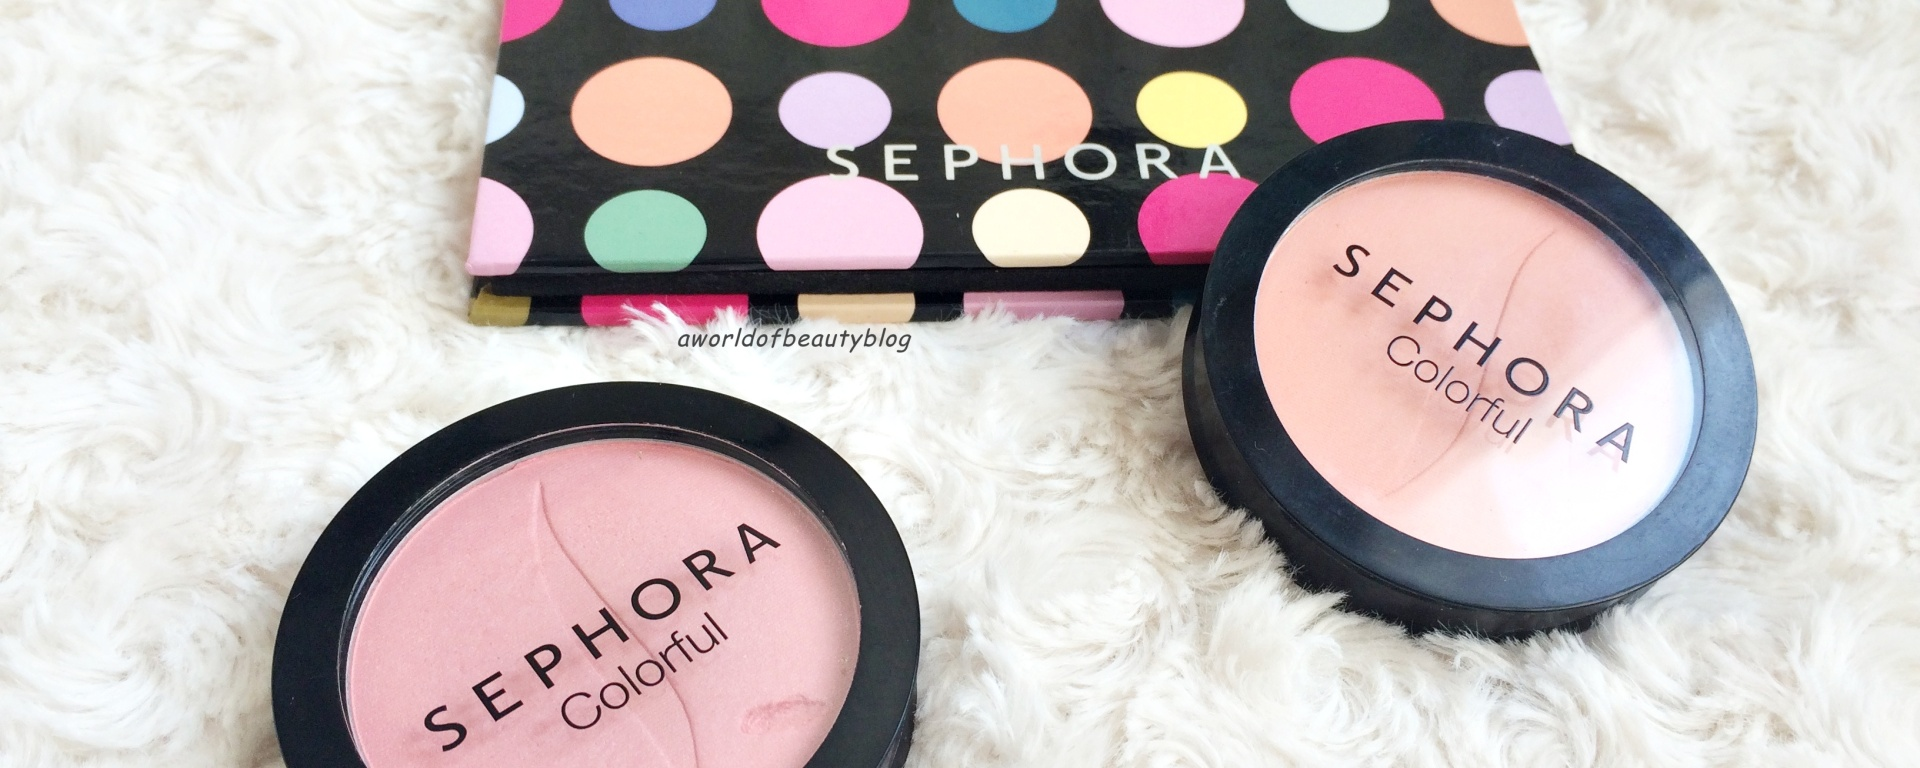 sephora n 2 colorful blush a world of beauty blog. Black Bedroom Furniture Sets. Home Design Ideas